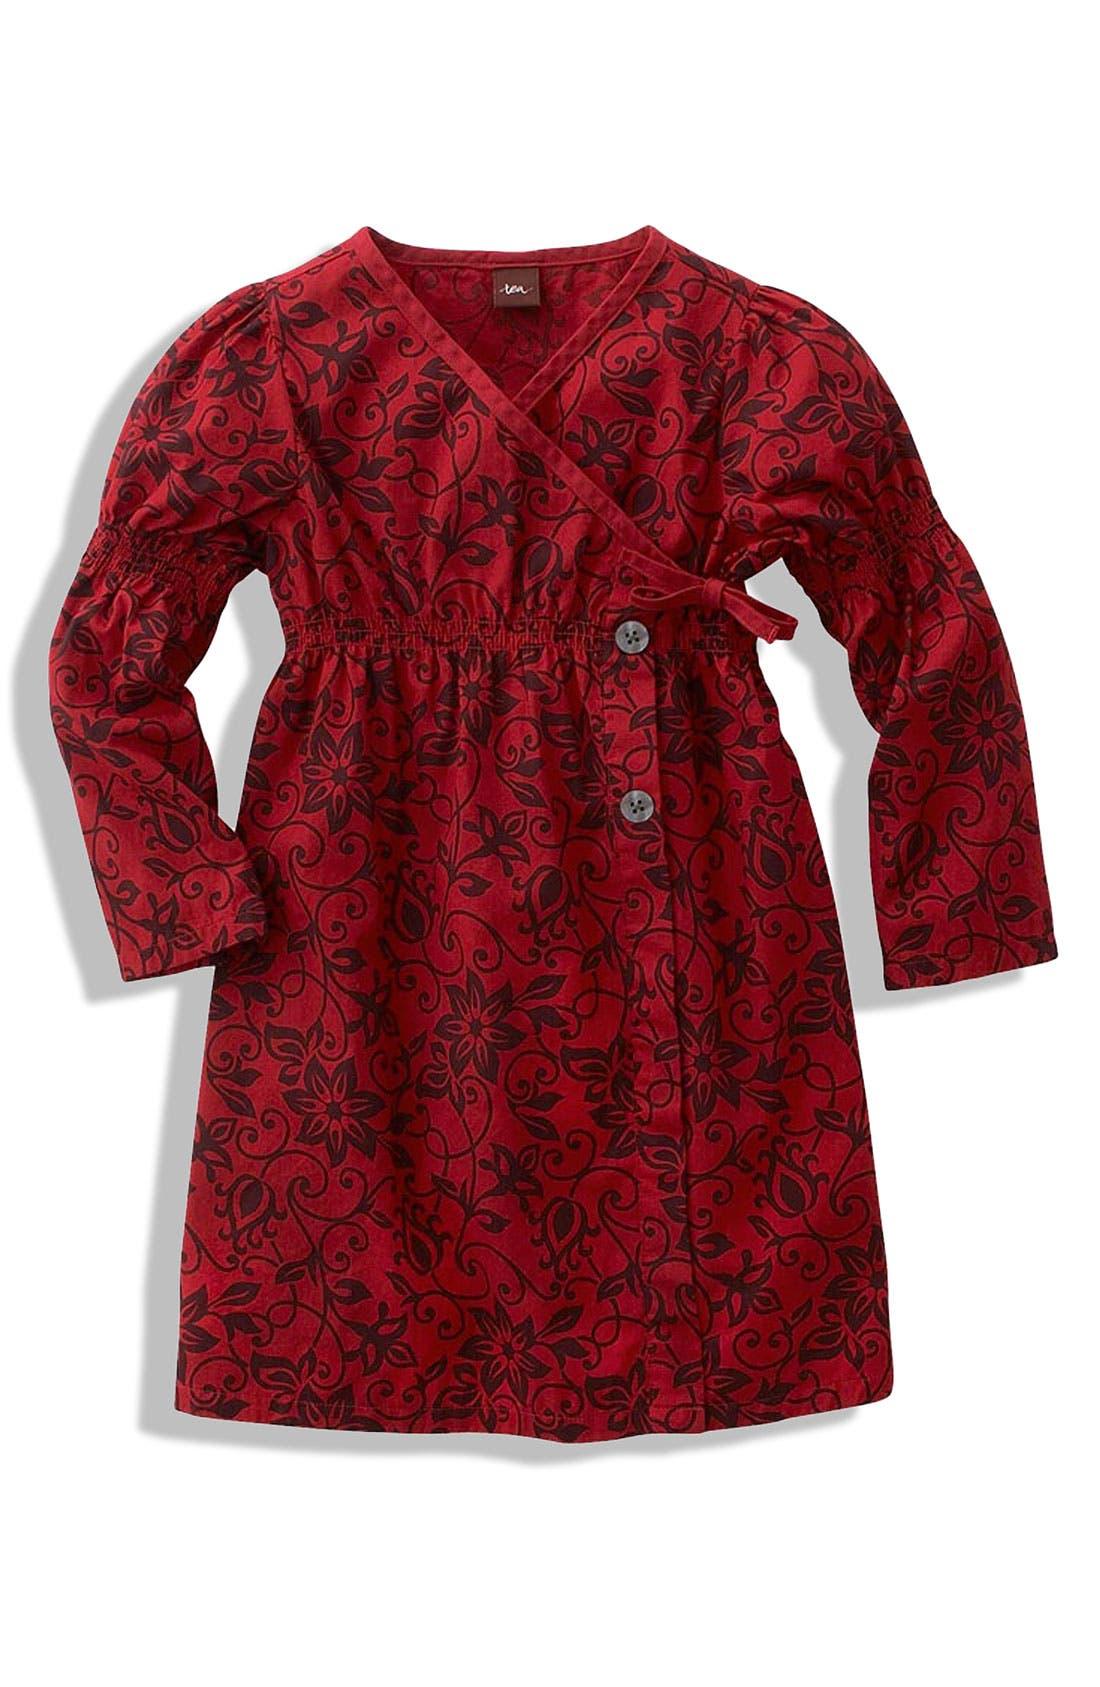 Alternate Image 1 Selected - Tea Collection 'Romania' Floral Poplin Dress (Little Girls)